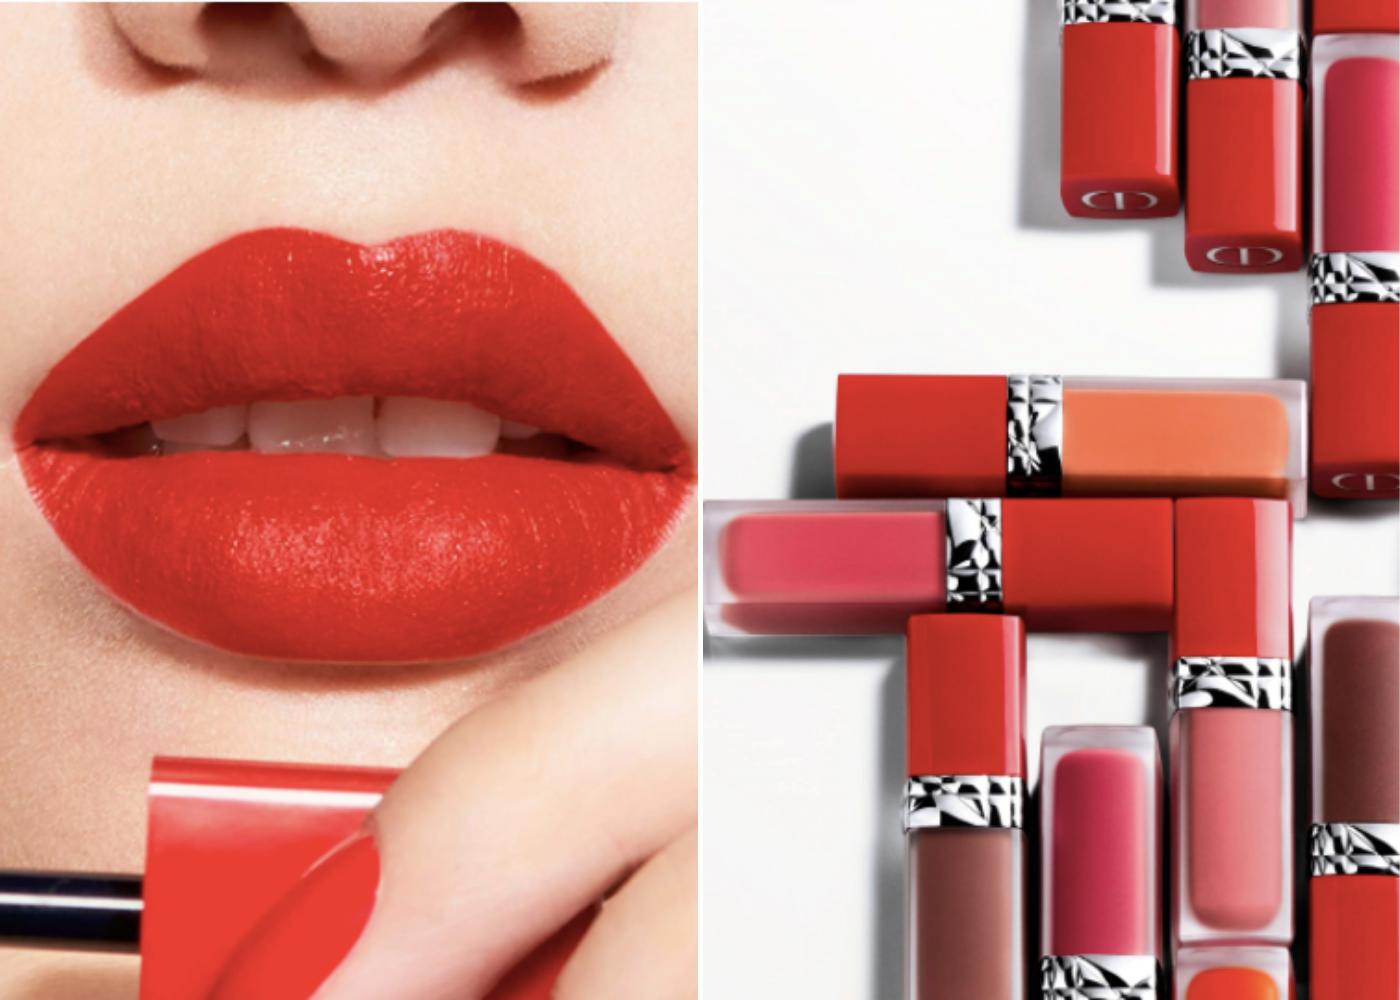 Dior-Rouge-Dior-Ultra-Care-Flower-Oil-Liquid-Lipstick-